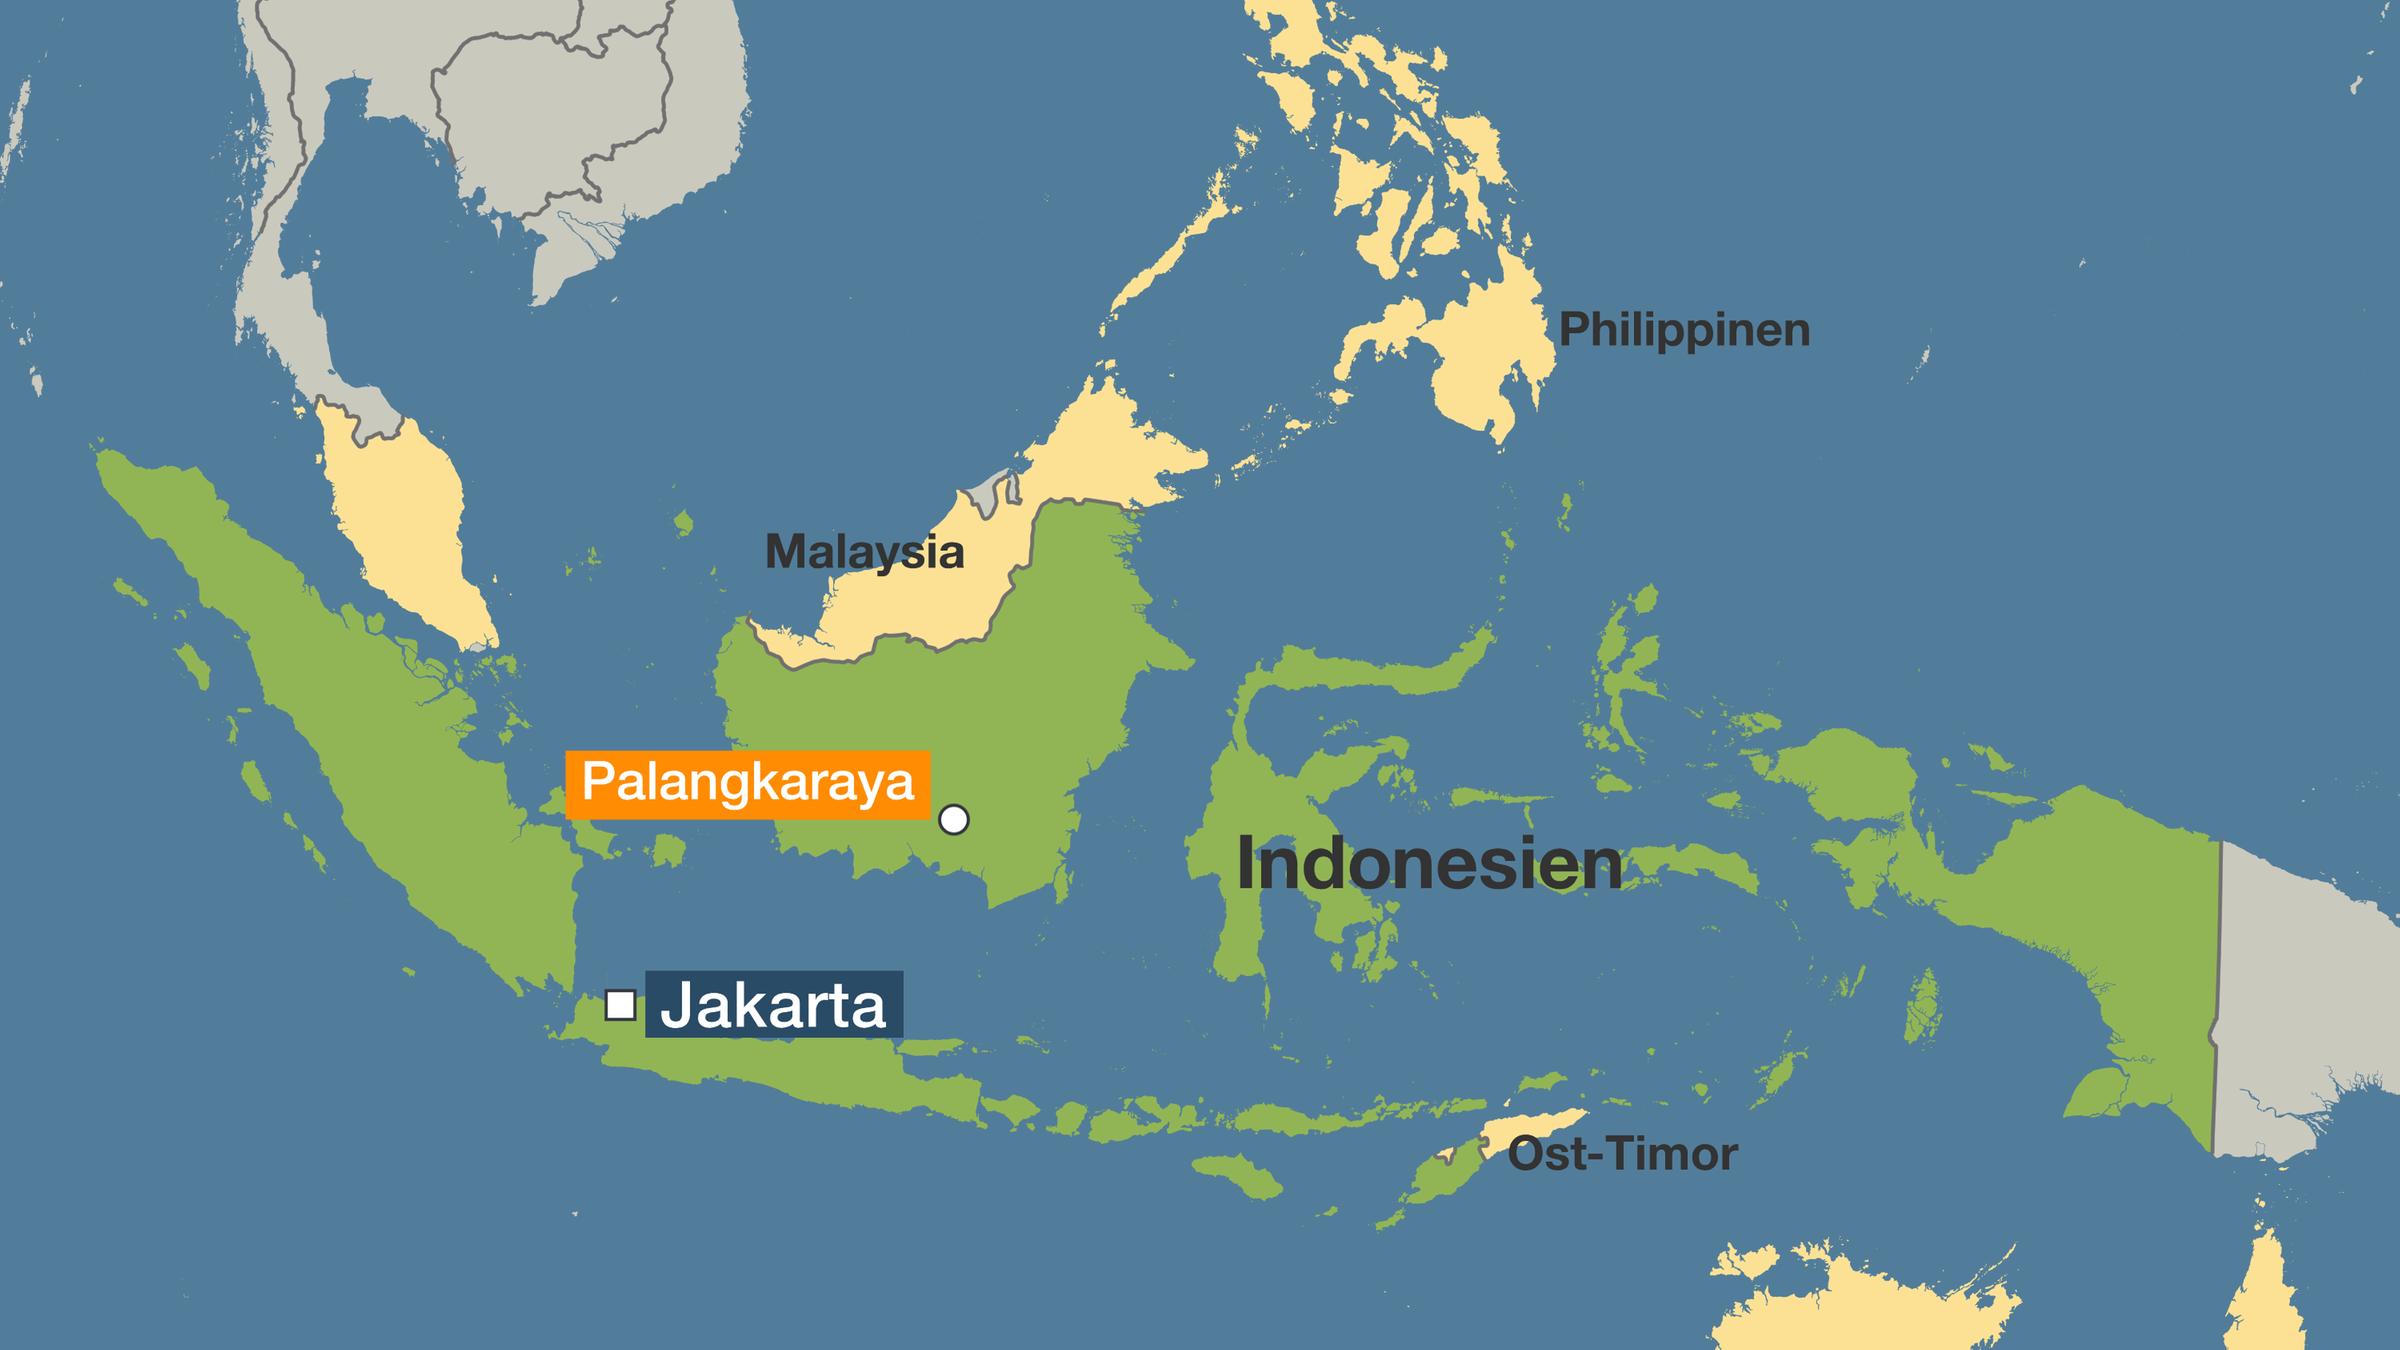 Neue Hauptstadt Palangkaraya Indonesiens Regierung Will Weg Aus Jakarta Zdfheute